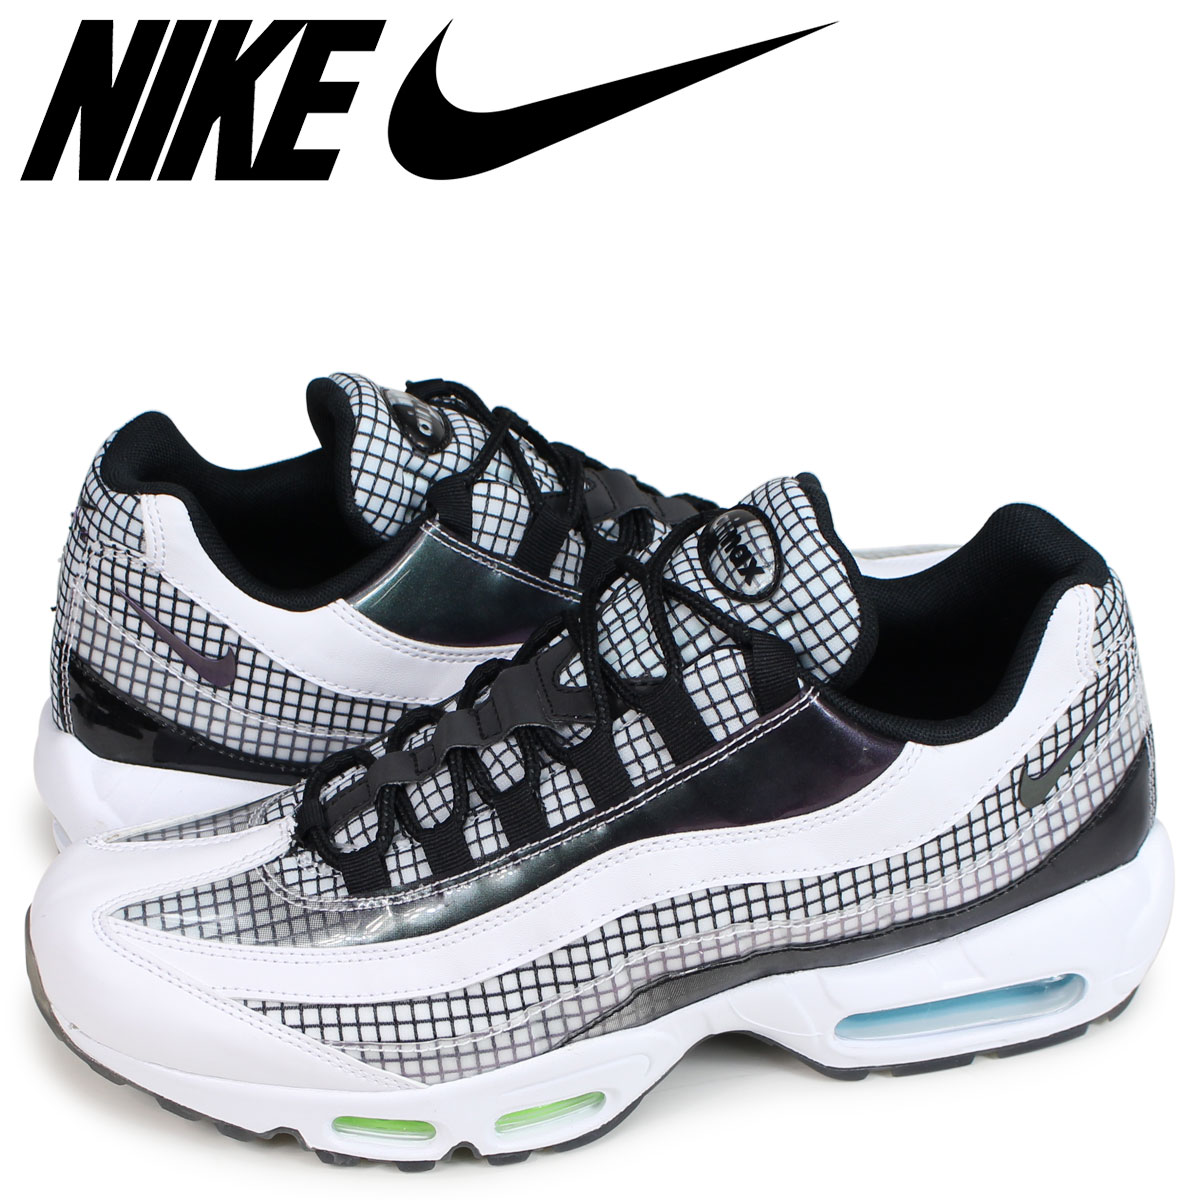 sports shoes c3962 84a6b NIKE AIR MAX 95 LV8 Kie Ney AMAX 95 sneakers men white AO2450-100